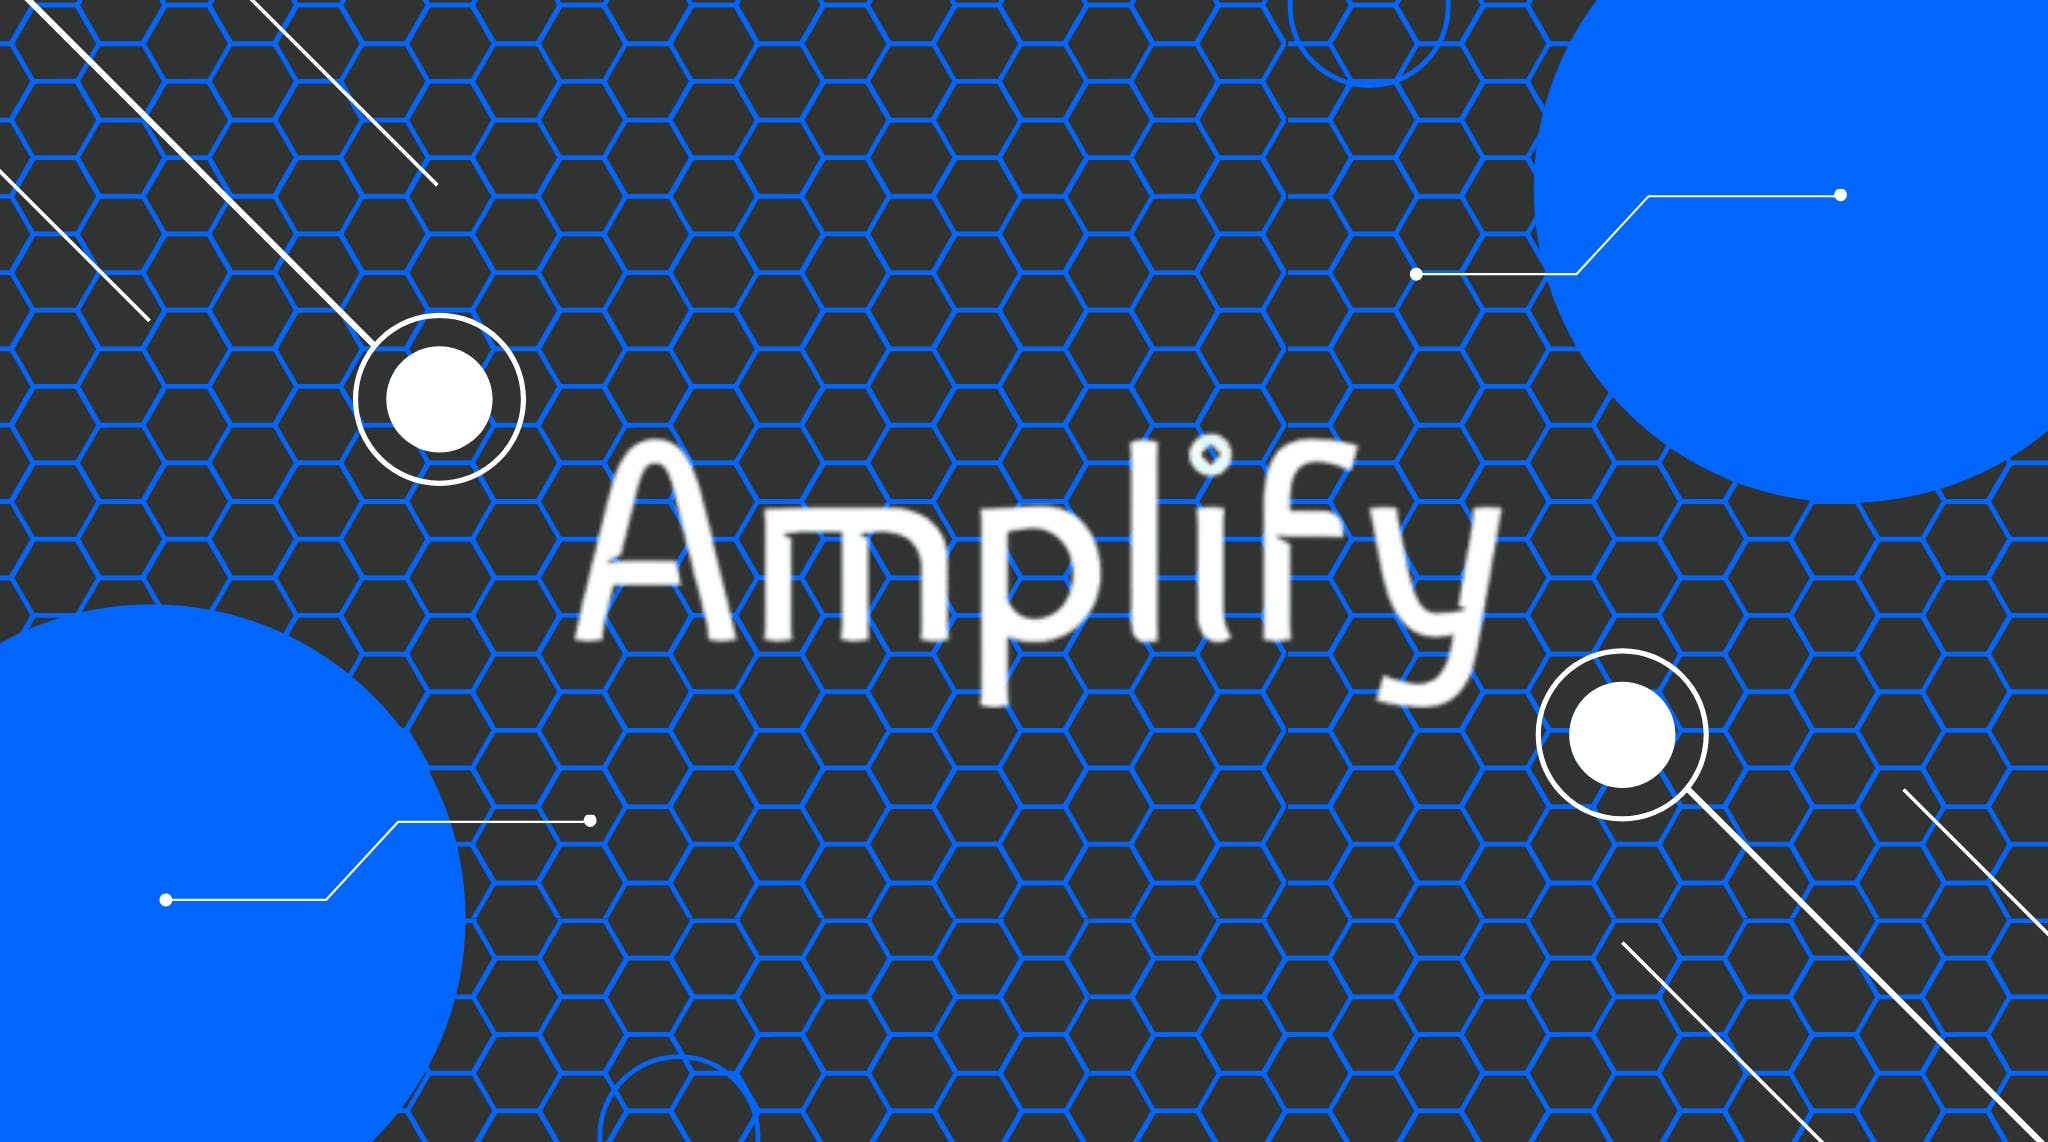 Amplify Protocol, IDO, AMPT tokens, $AMPT, Defi, Real World Assets, Tokenization platform, TradeFi,